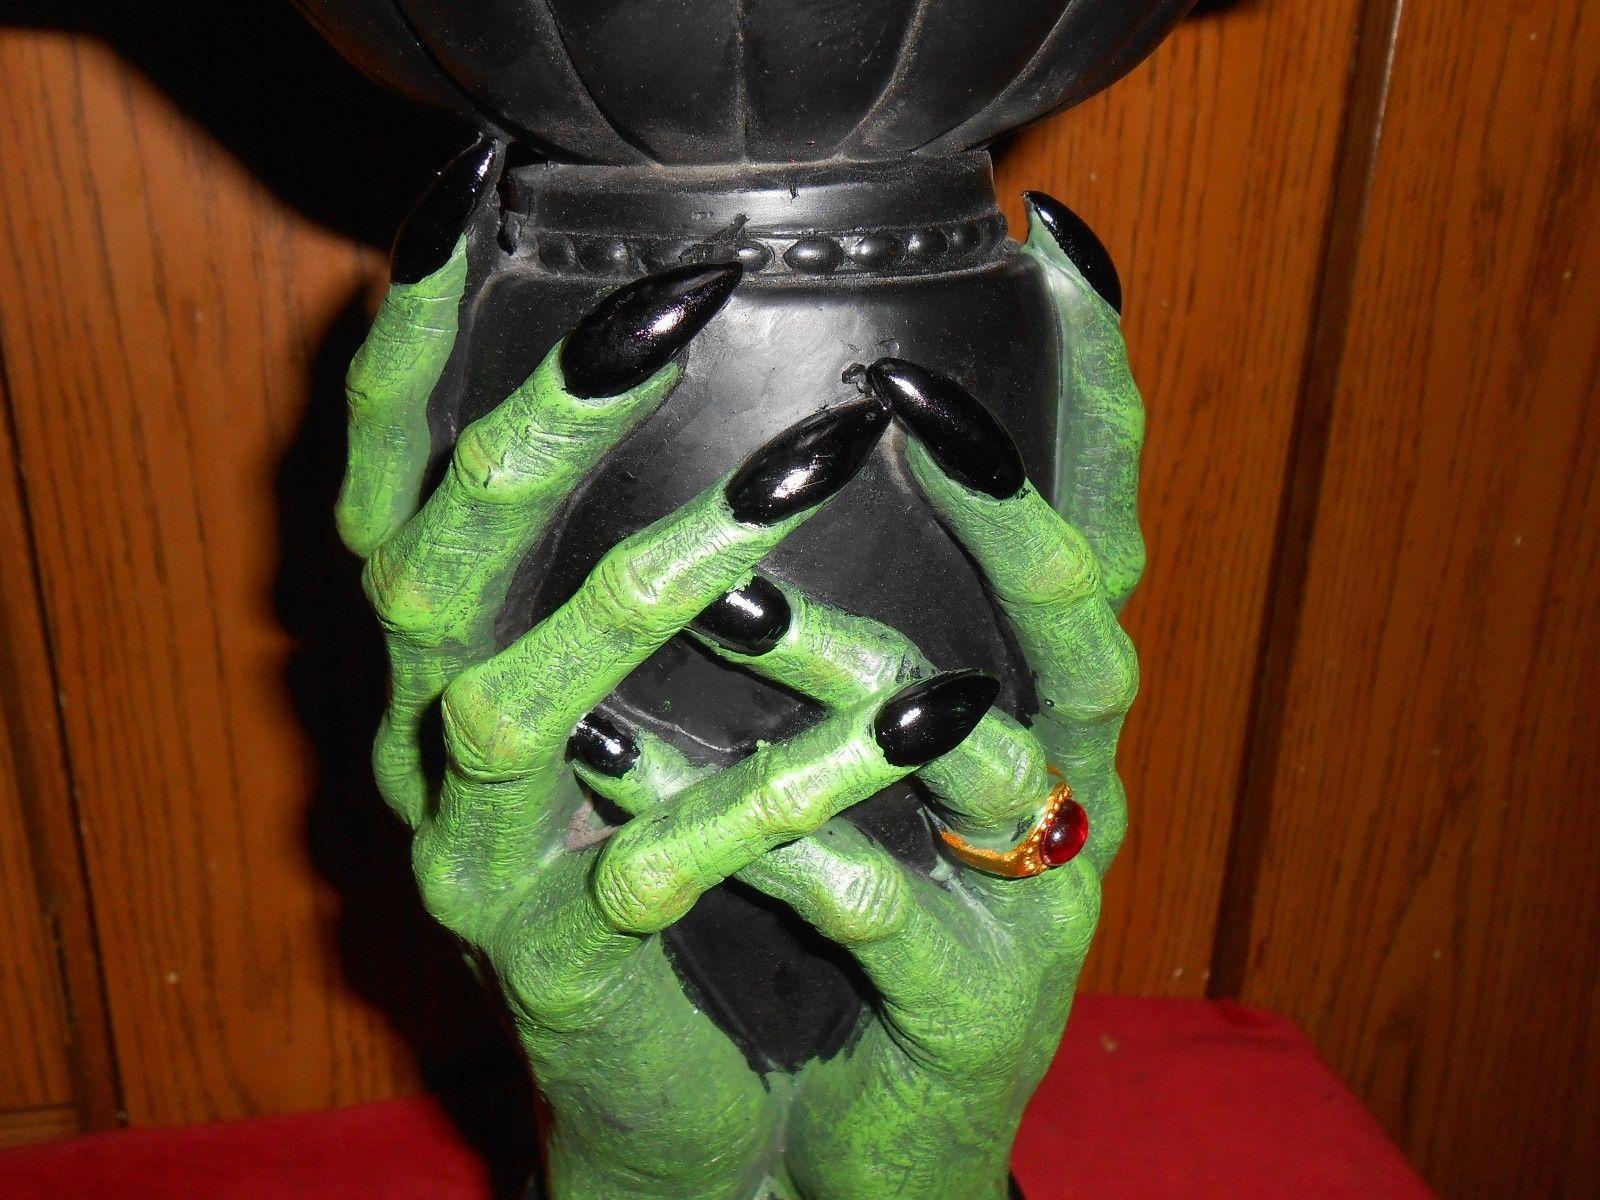 grandin road wicked candle holder new in box great halloween decoration ebay - Halloween Decorations Ebay